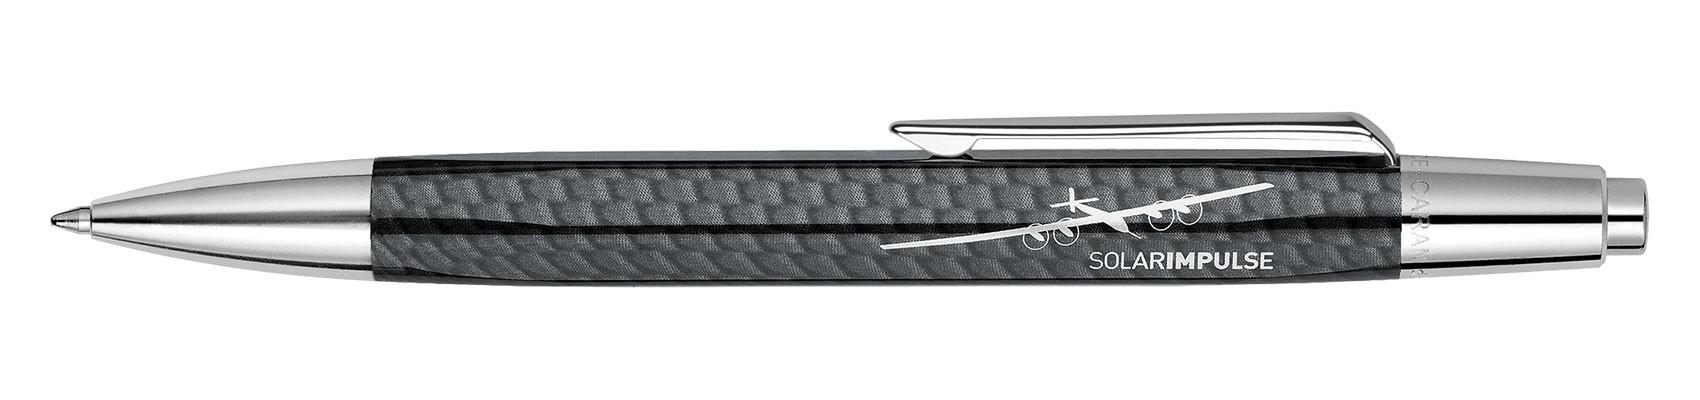 Шариковая ручка Caran d'Ache Office Alchemix Solar Impulse